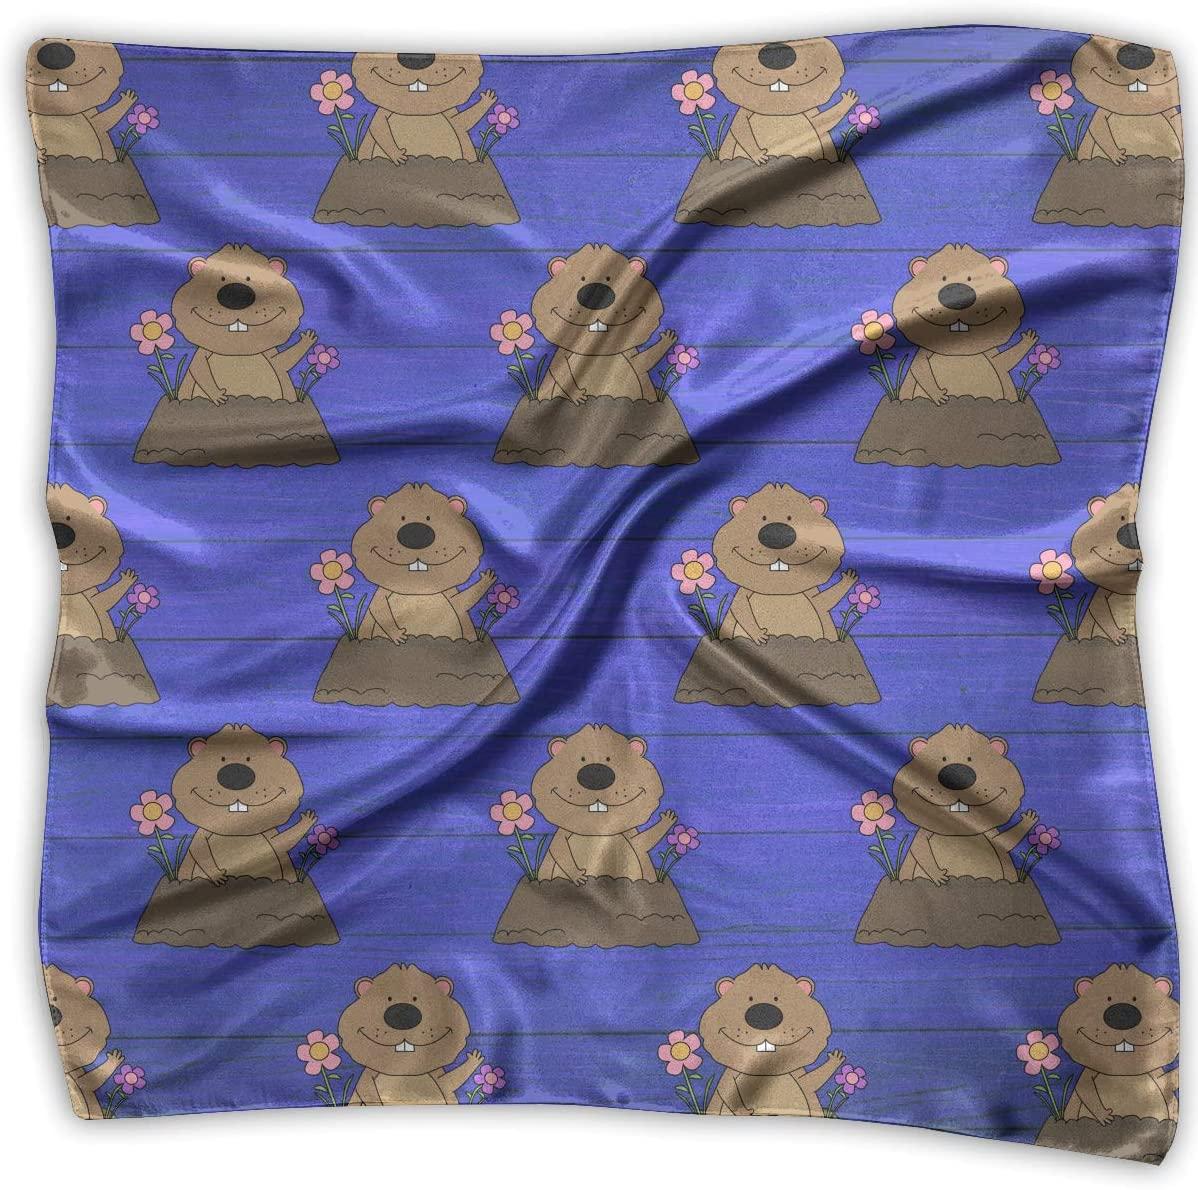 WFIRE Groundhog Day Square Handkerchiefs Scarf Shawl Bandanas Headscarf Neckerchief Tie Hair Scarf